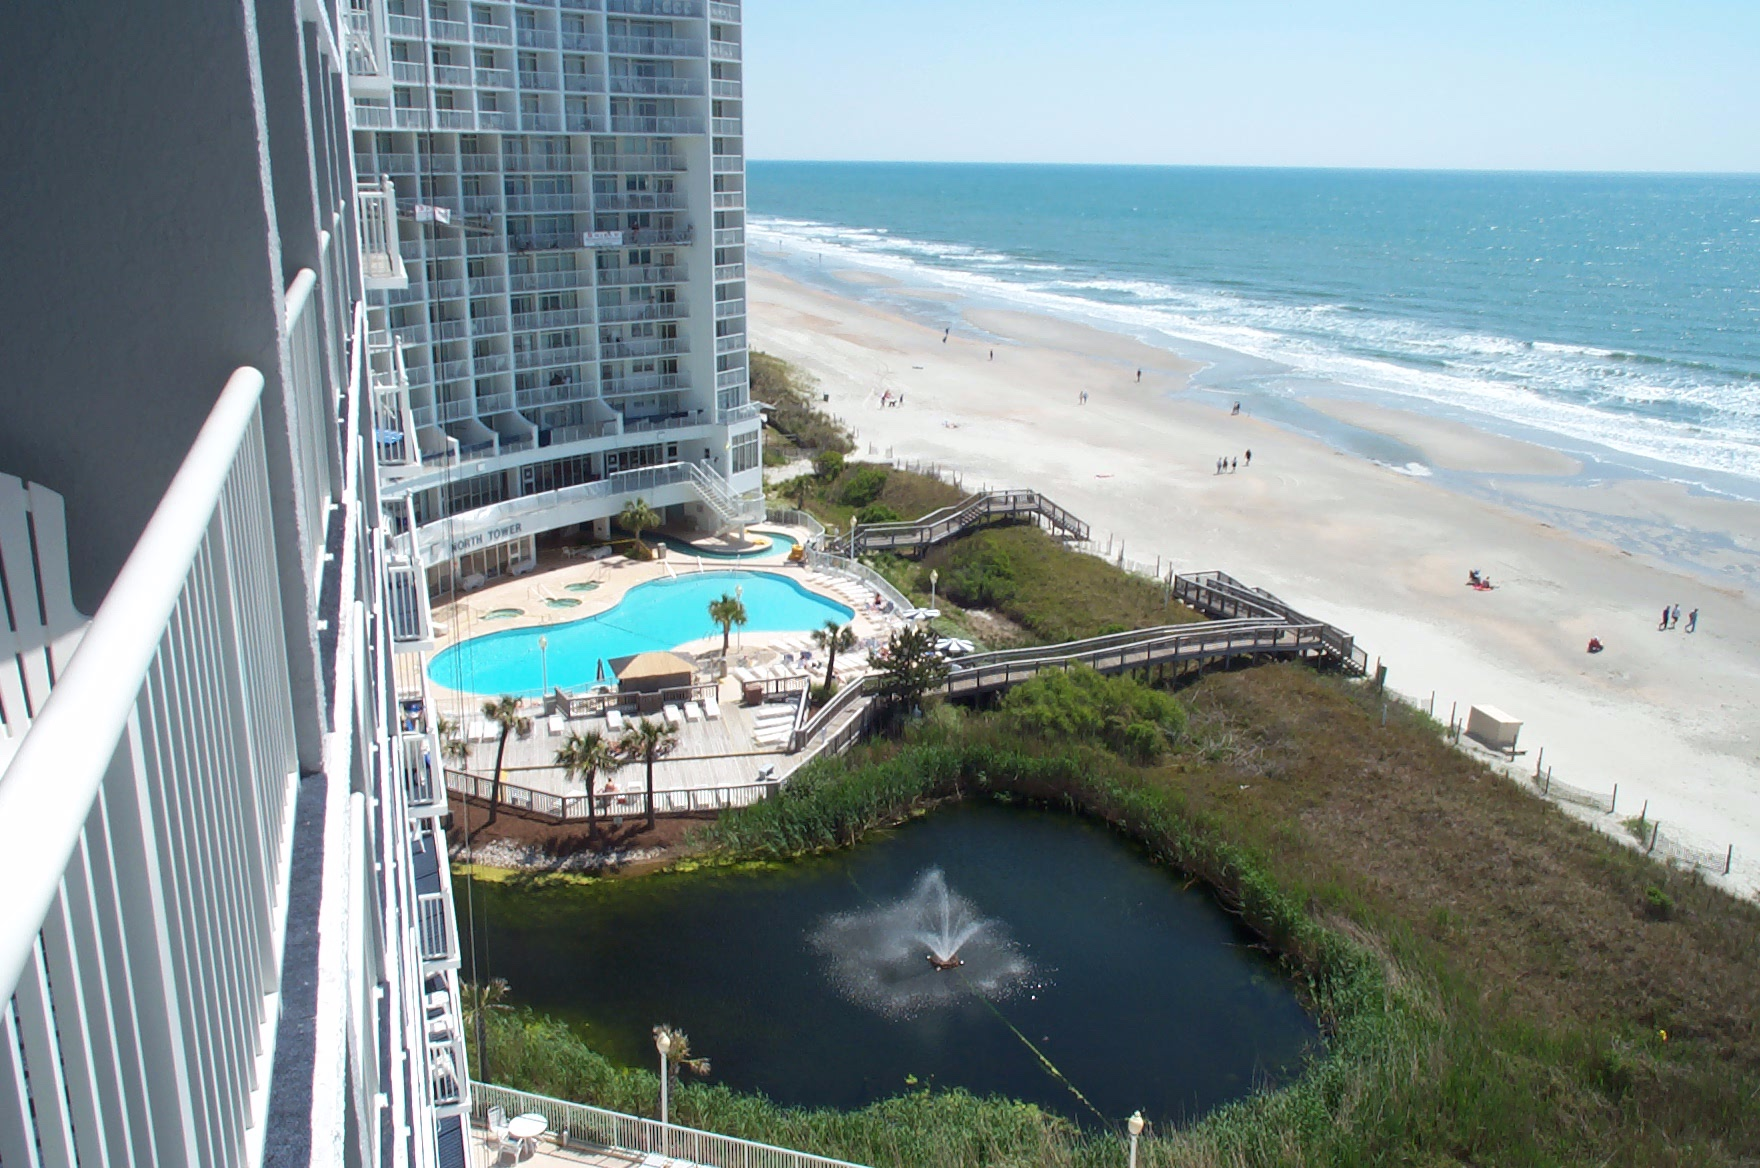 Apartment Seawatch Plantation 2 Bedrooms 2 Bathrooms photo 20365218